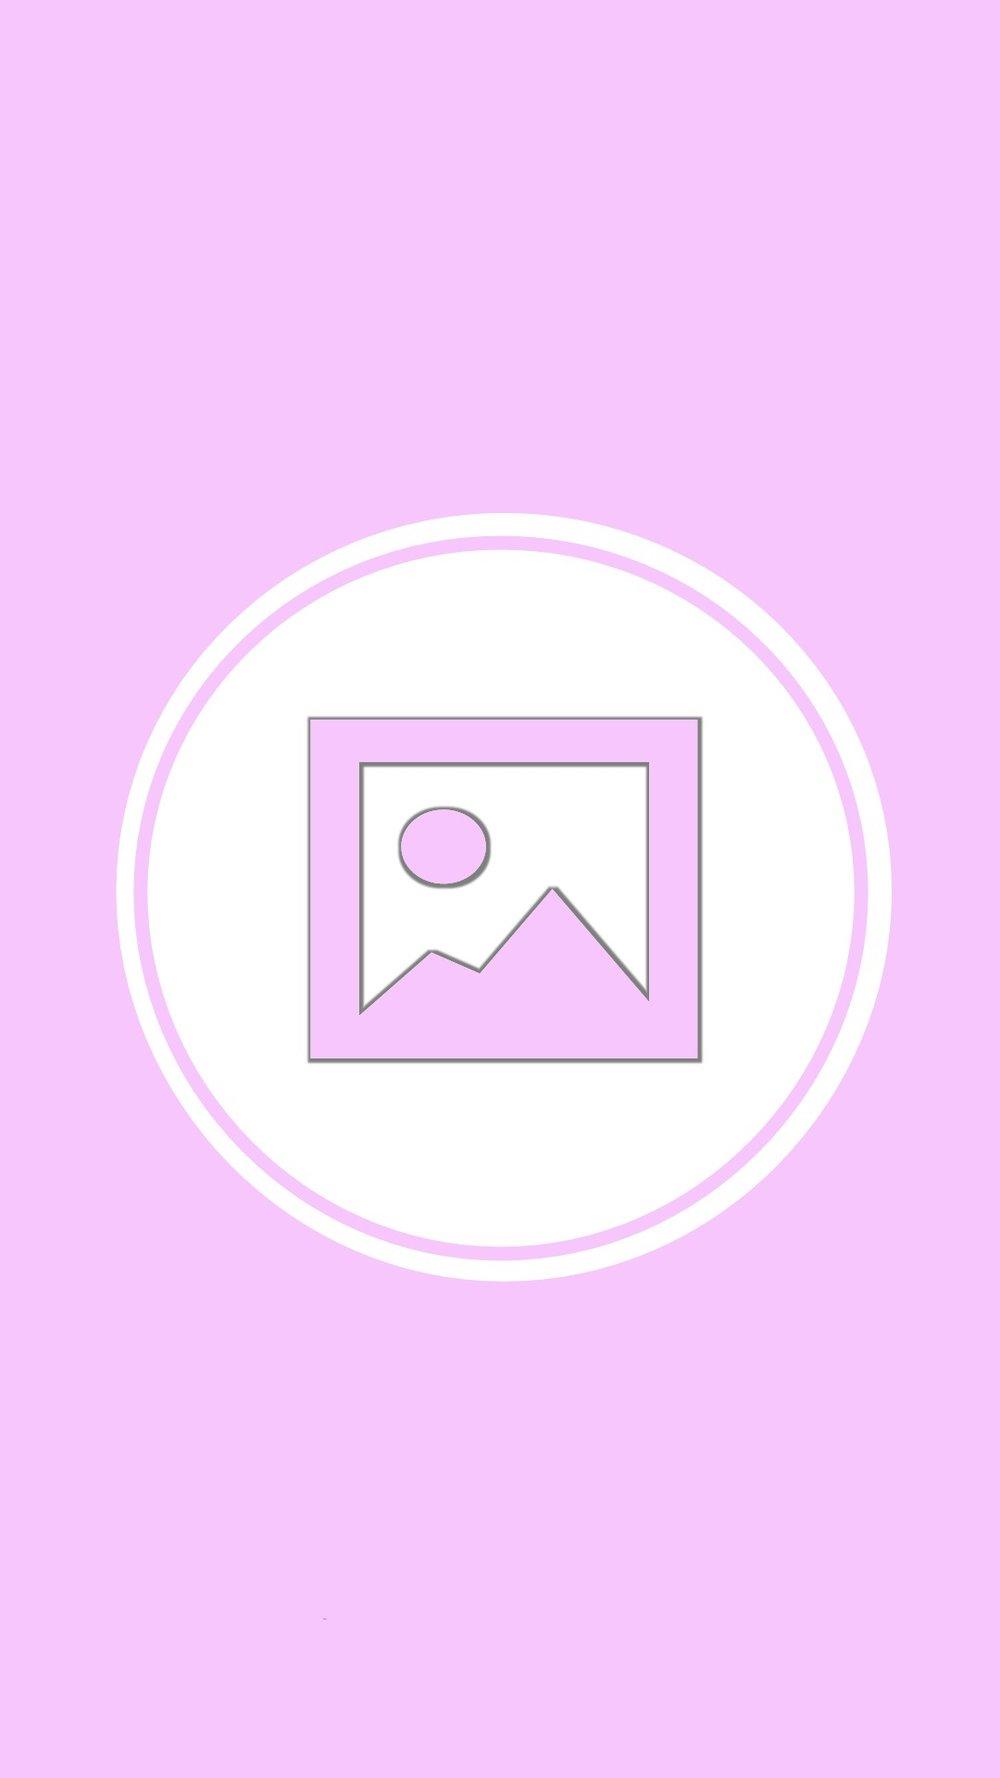 Instagram-cover-photoicon-pink-lotnotes.com.jpg